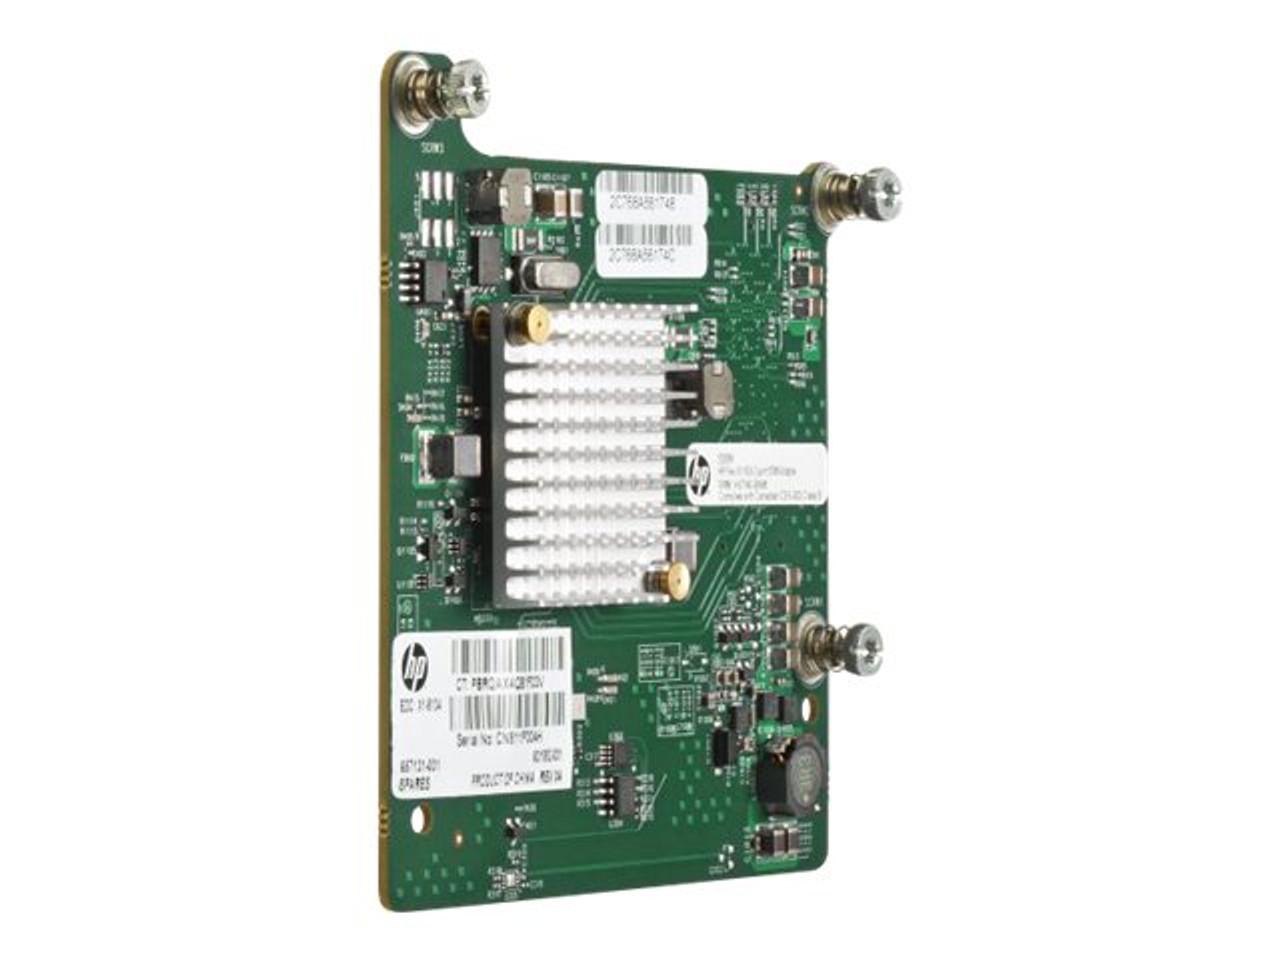 10GbE 2-Port PCI-E 2.0 x8 FlexibleLOM NIC 665243-B21 HPE 669281-001 560FLR-SFP